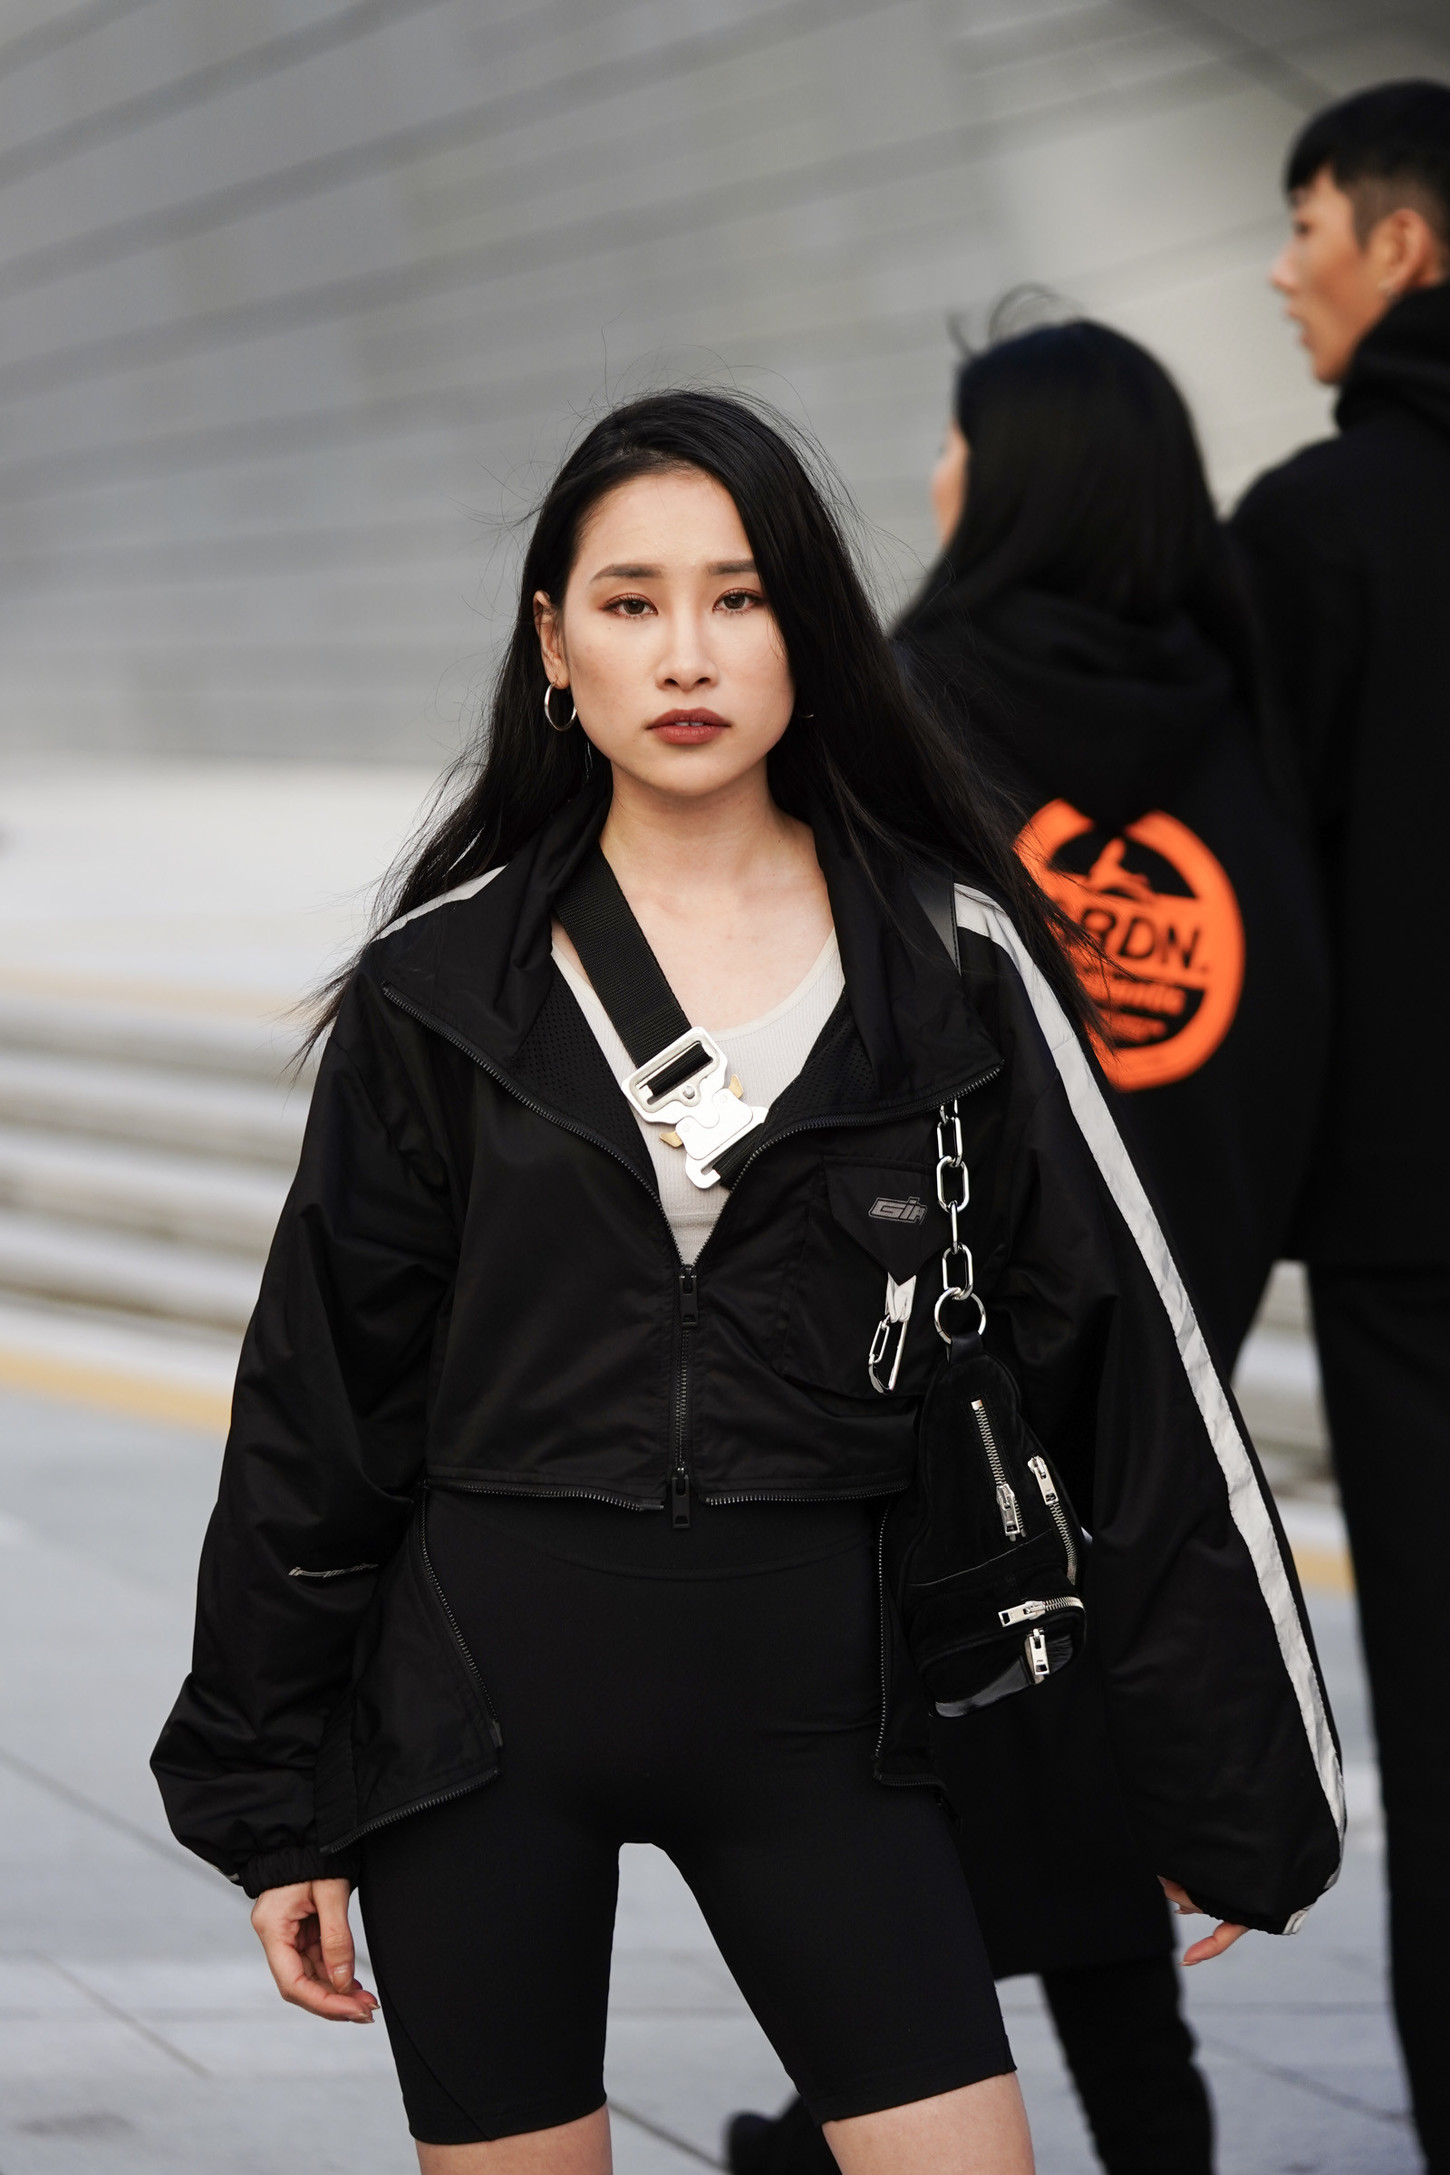 Evangeline Yan